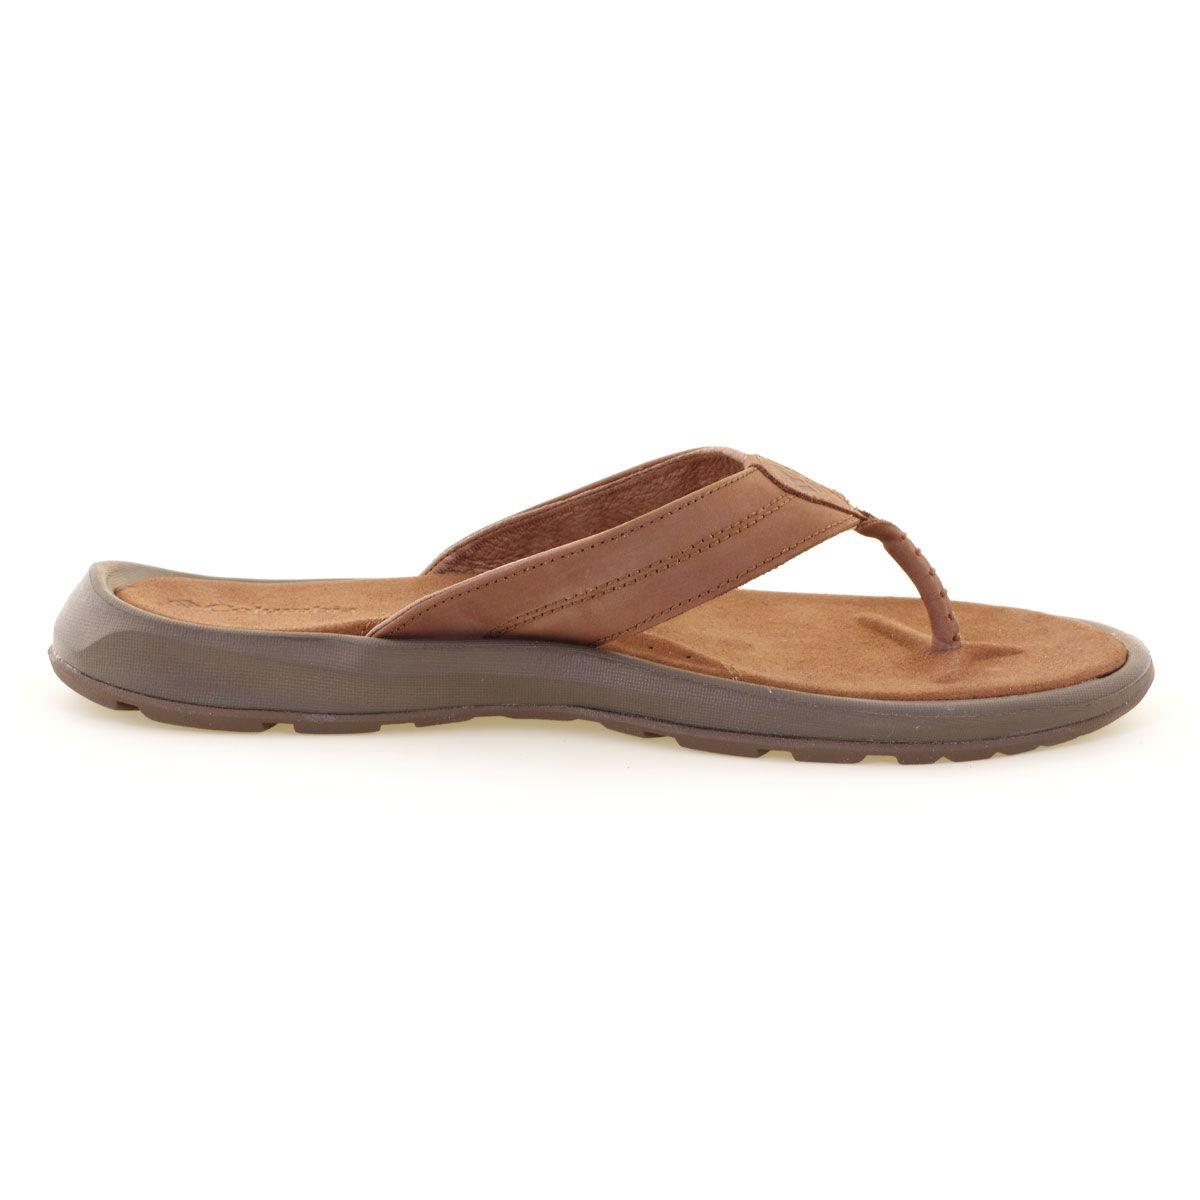 chaussures manarola ii brun grande taille du 46 au 50. Black Bedroom Furniture Sets. Home Design Ideas